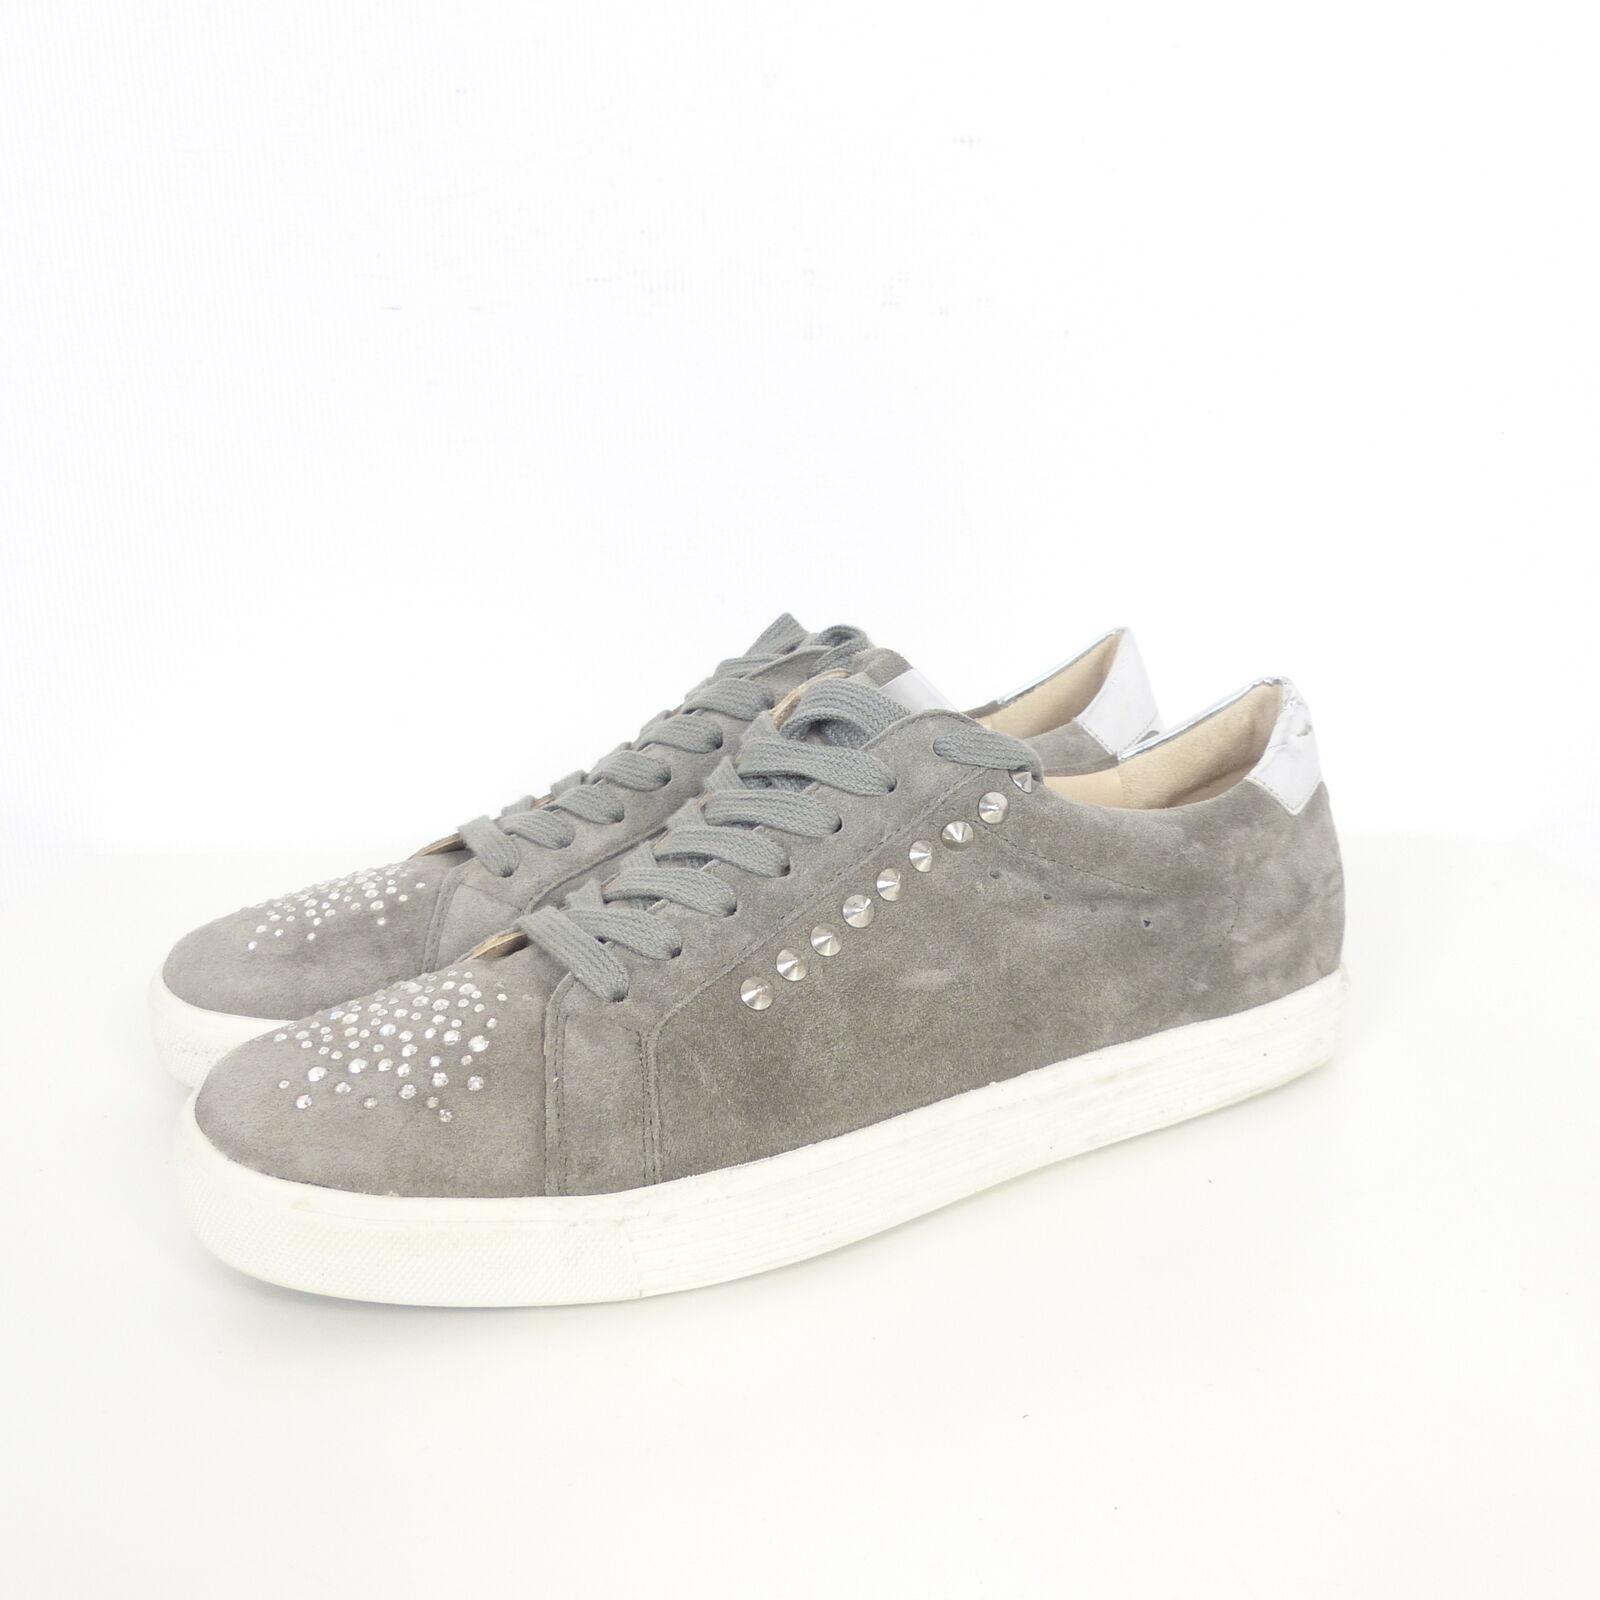 KENNEL & SCHMENGER Sneaker Turnschuhe Swarovski Nieten grey Gr. 8,5